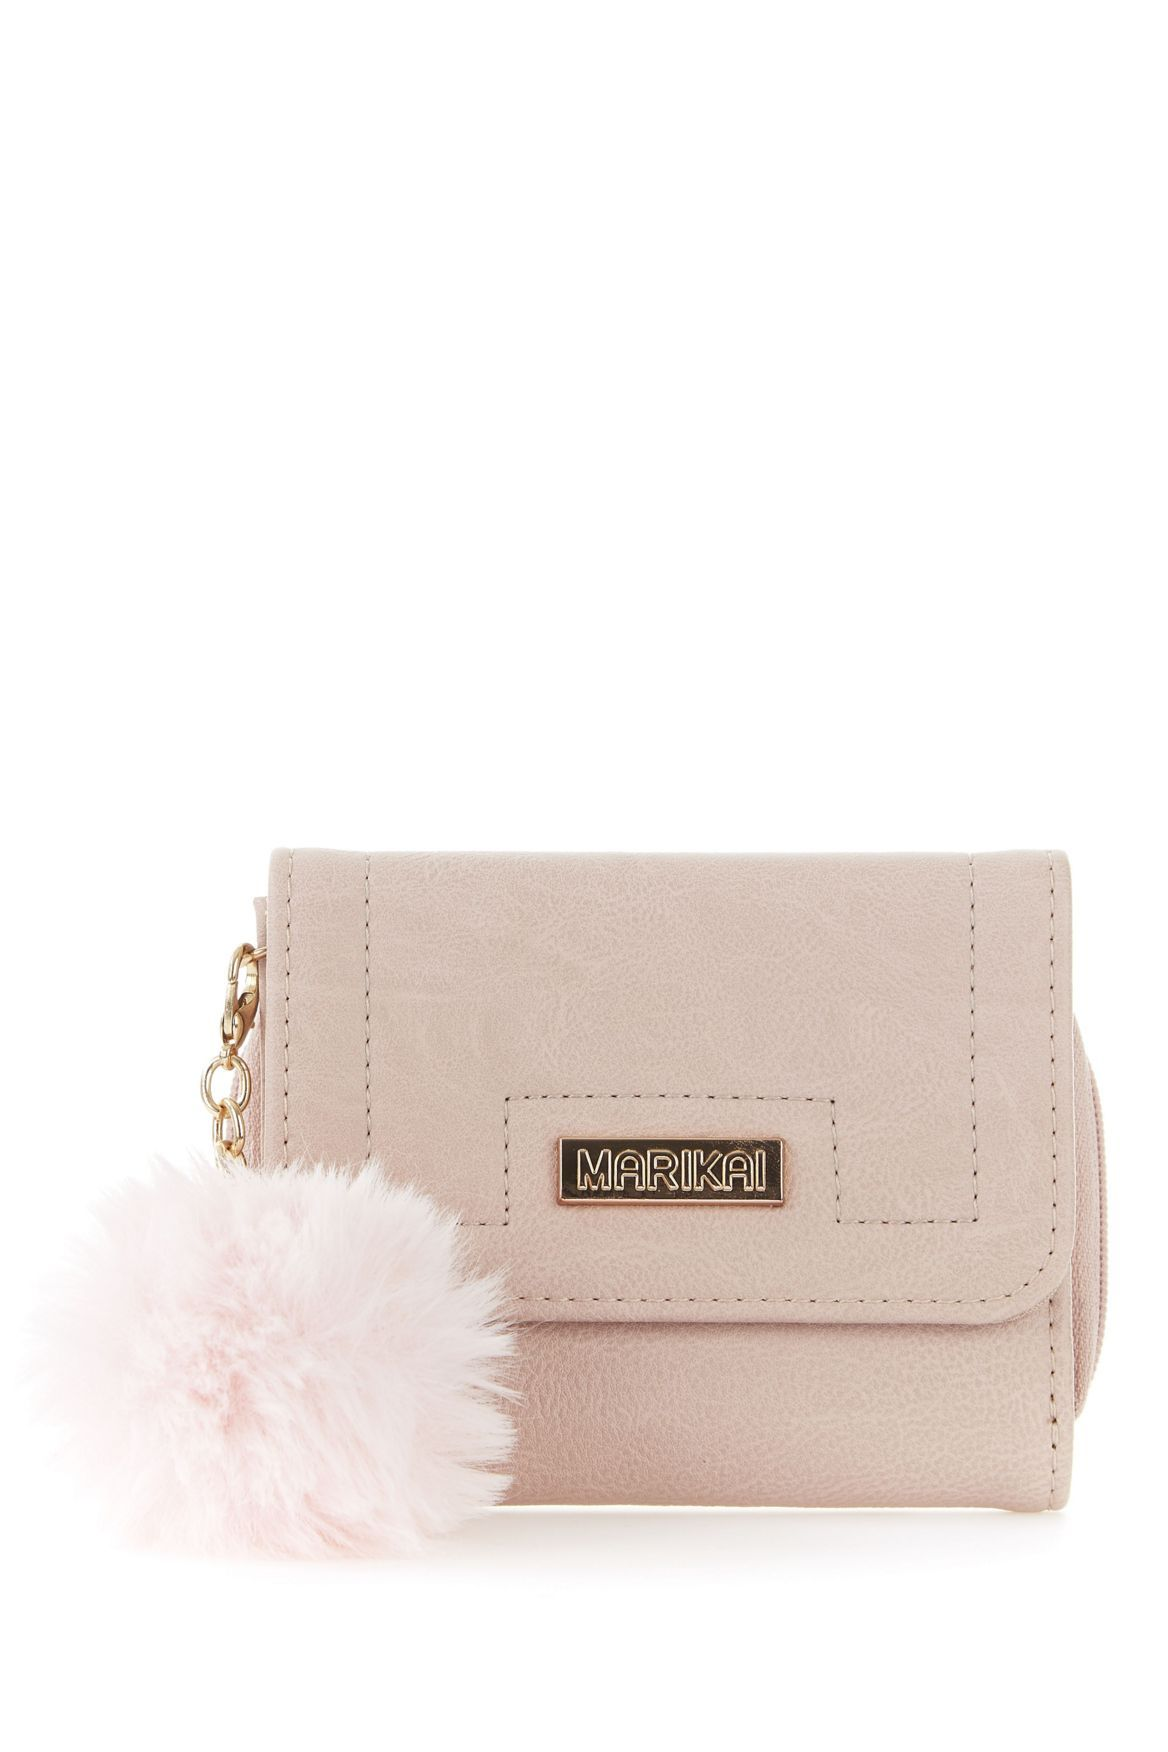 1f1a2f1055 marikai small trifold wallet 3169888 womens wallets strandbags australia